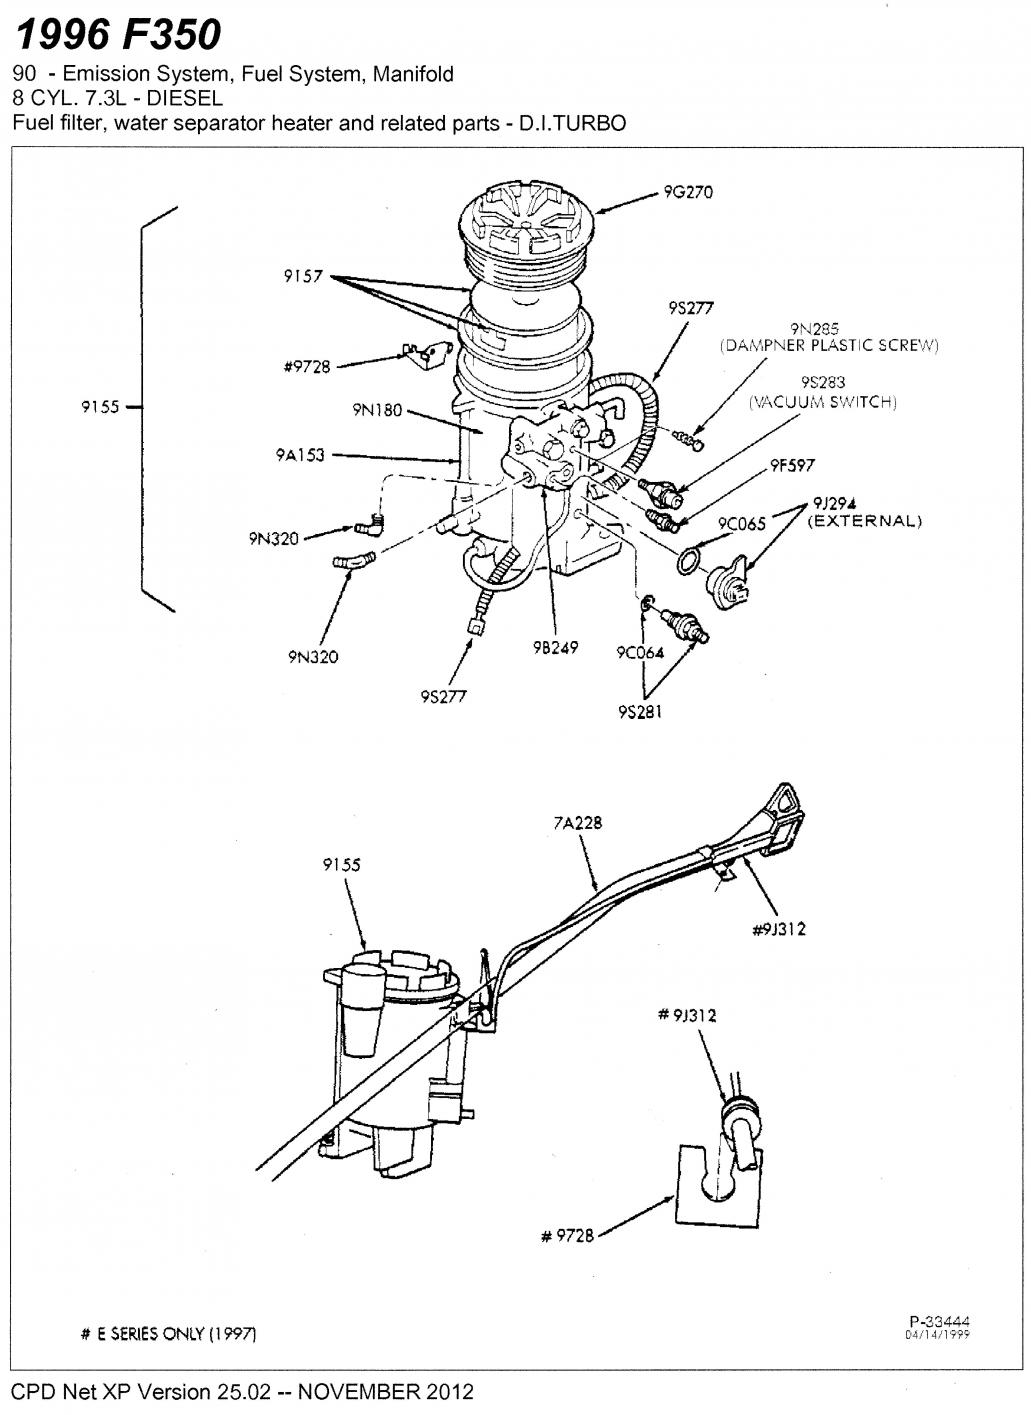 2013 Nissan Sentra Oil Capacity : nissan, sentra, capacity, DIAGRAM], Powerstroke, Filter, Diagram, Version, Quality, LINKDIAGRAMS.MARATONINAVCO.IT